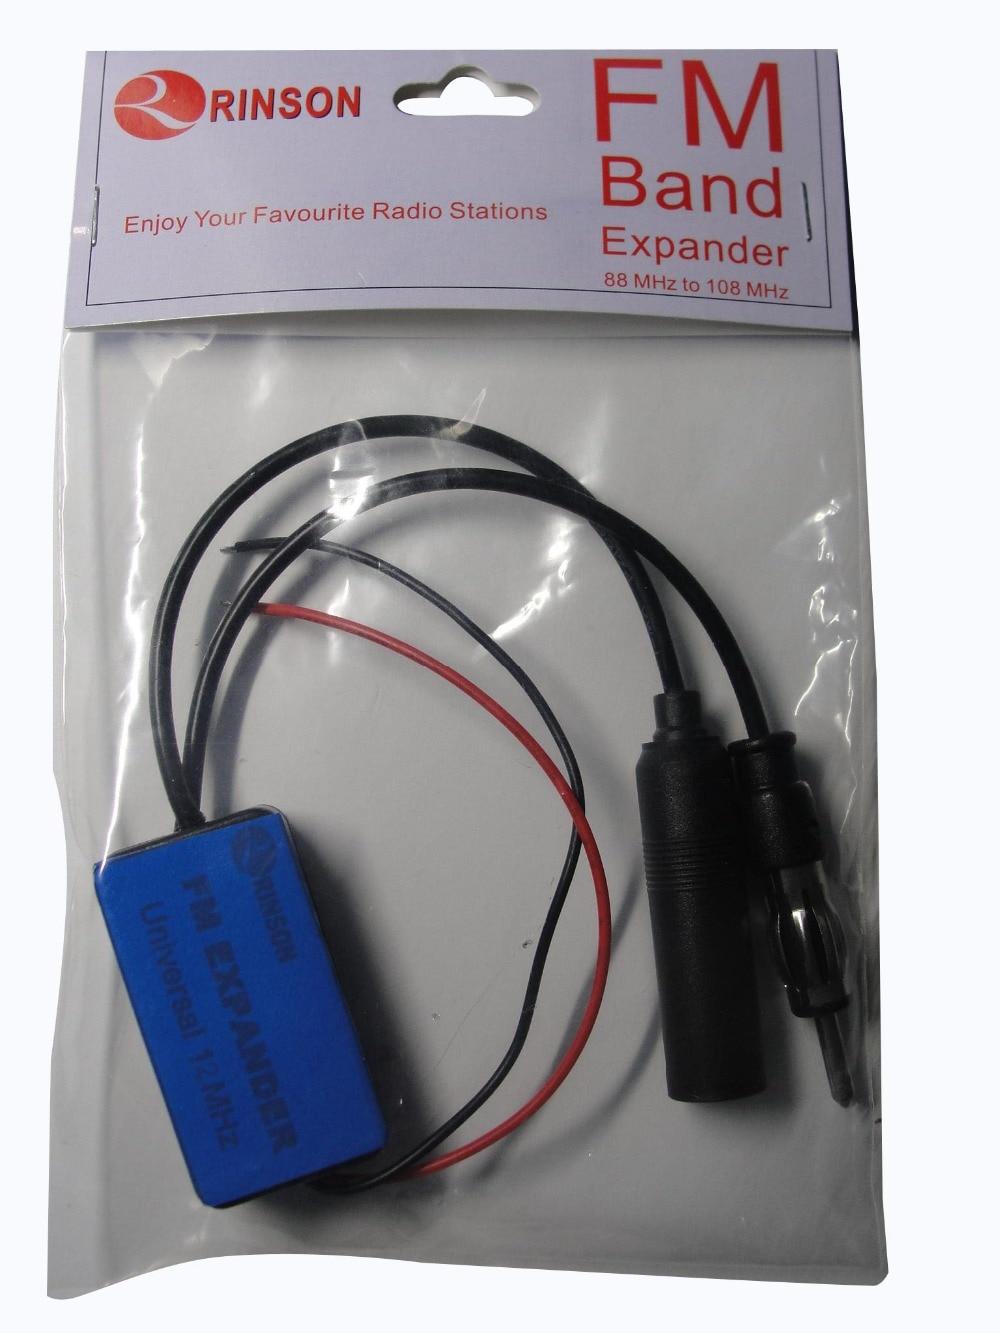 12 MHz autocassettespeler Radio FM-converter FM-band EXpander - Auto-elektronica - Foto 3